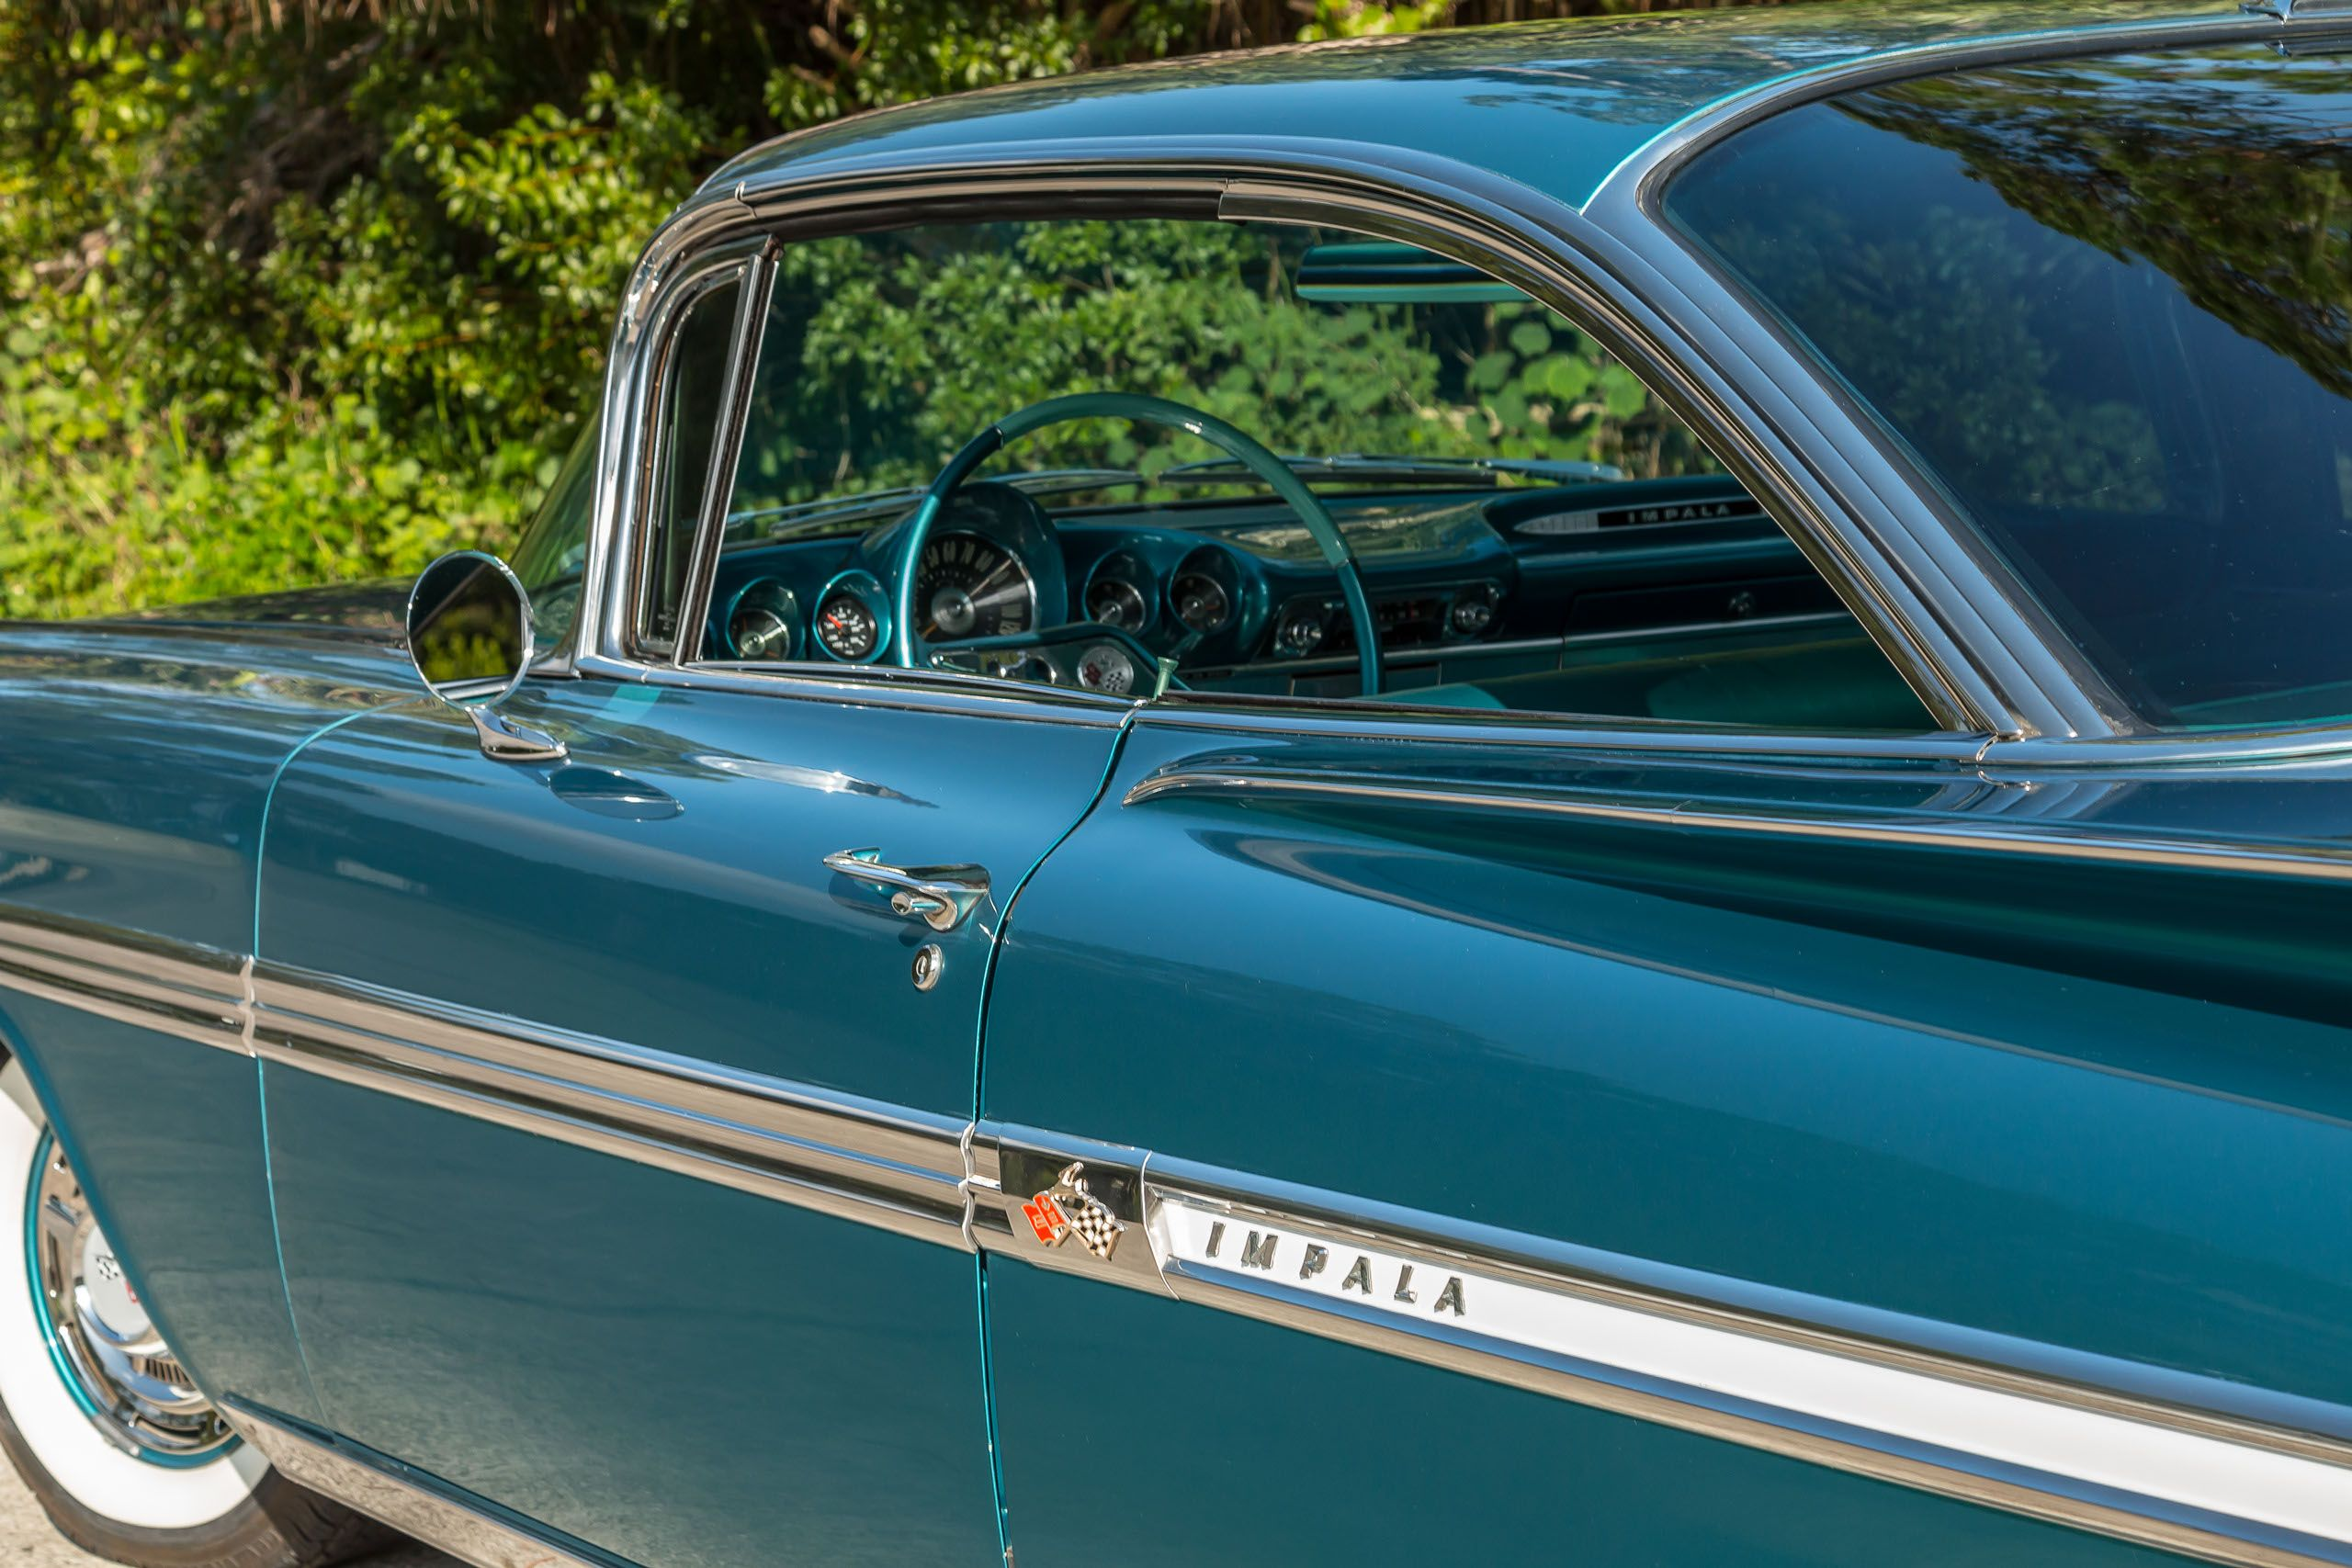 59 chevy impala chevy impalaimpalasalechevrolethtmlclassic cars